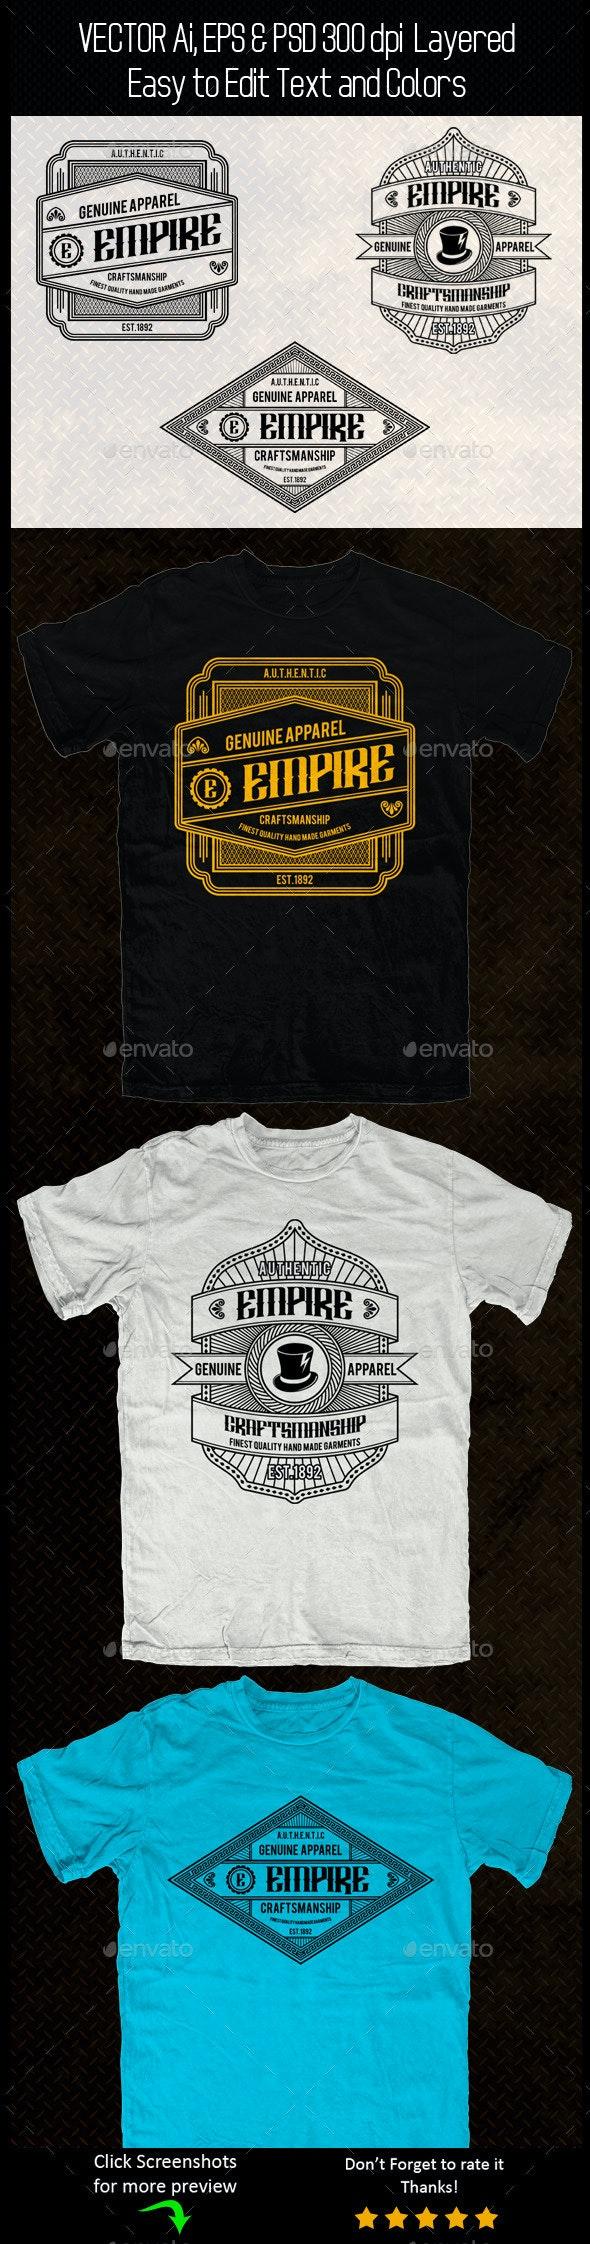 Vintage T-shirt Template - Designs T-Shirts